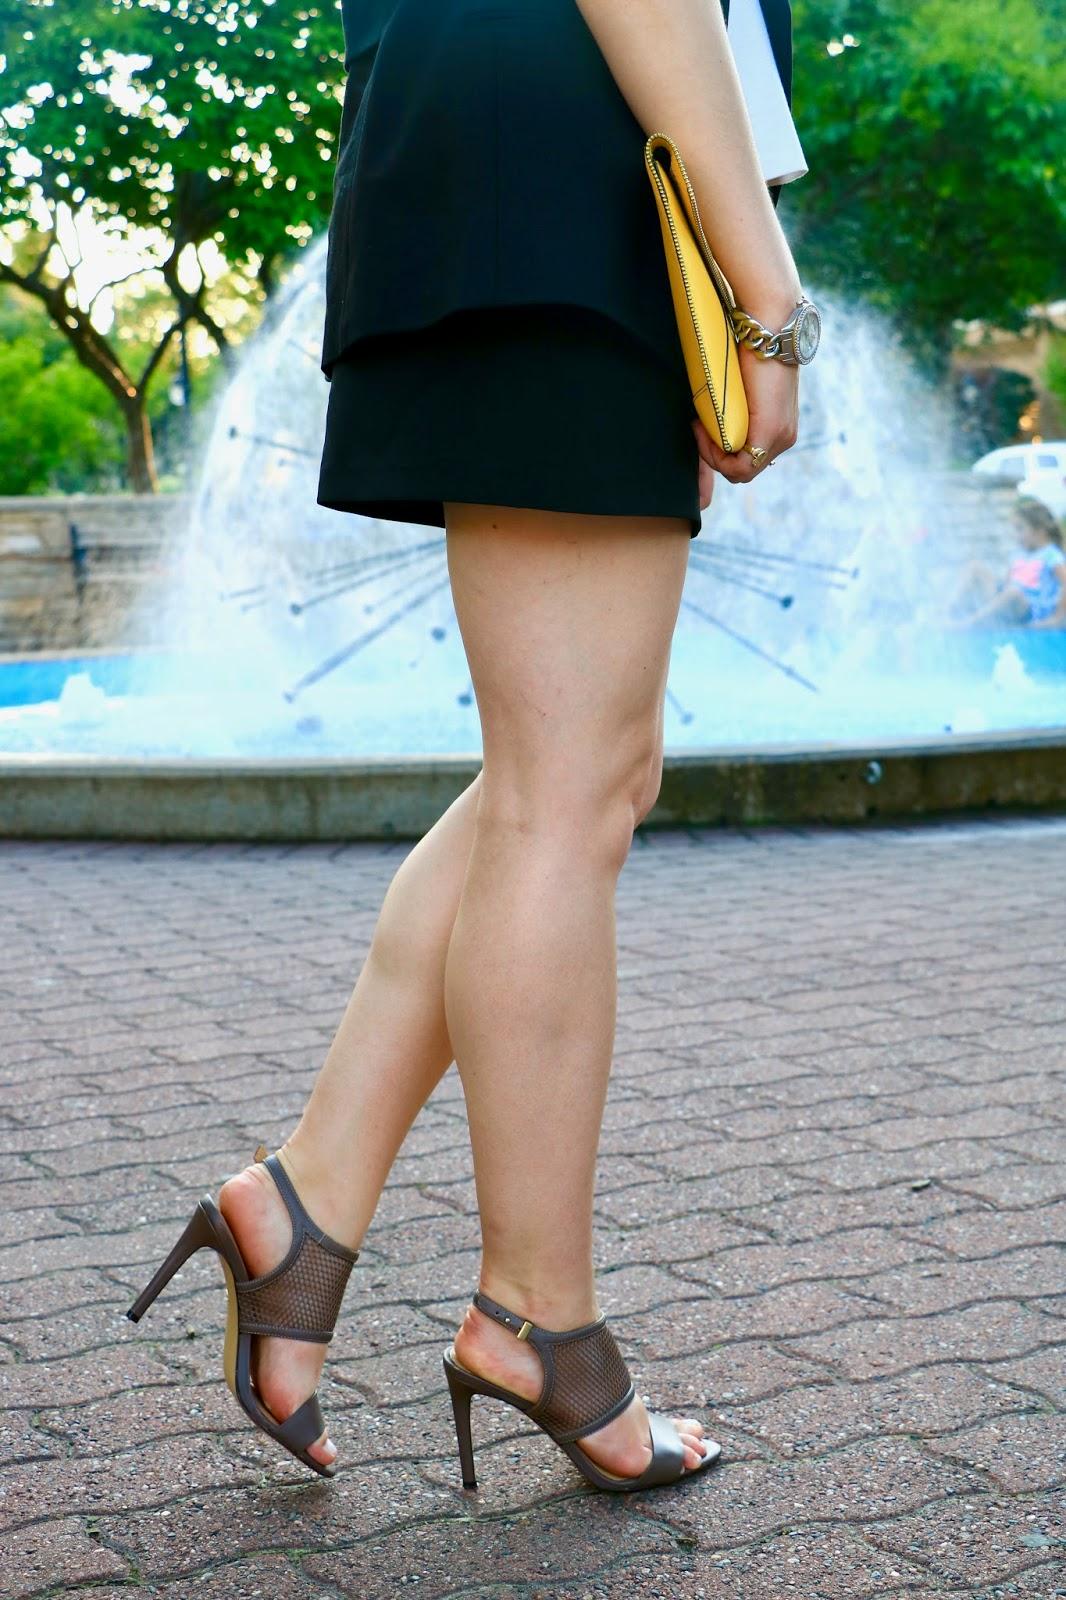 NYC fashion blogger Kathleen Harper of Kat's Fashion Fix wearing shorts with heels